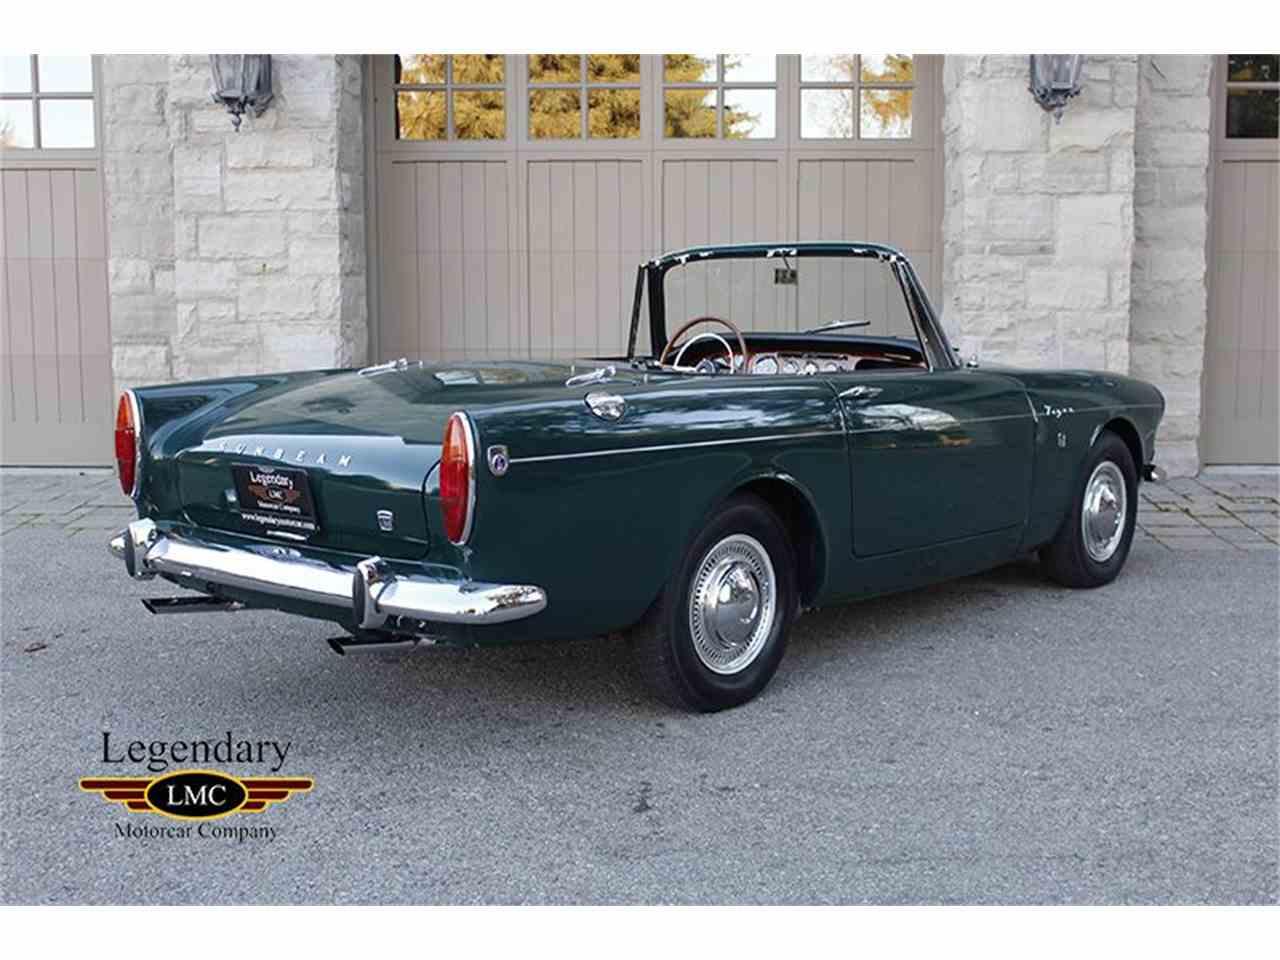 All sunbeam car company models list of sunbeam car company cars - Classic Car Inspections By Classic Car Experts